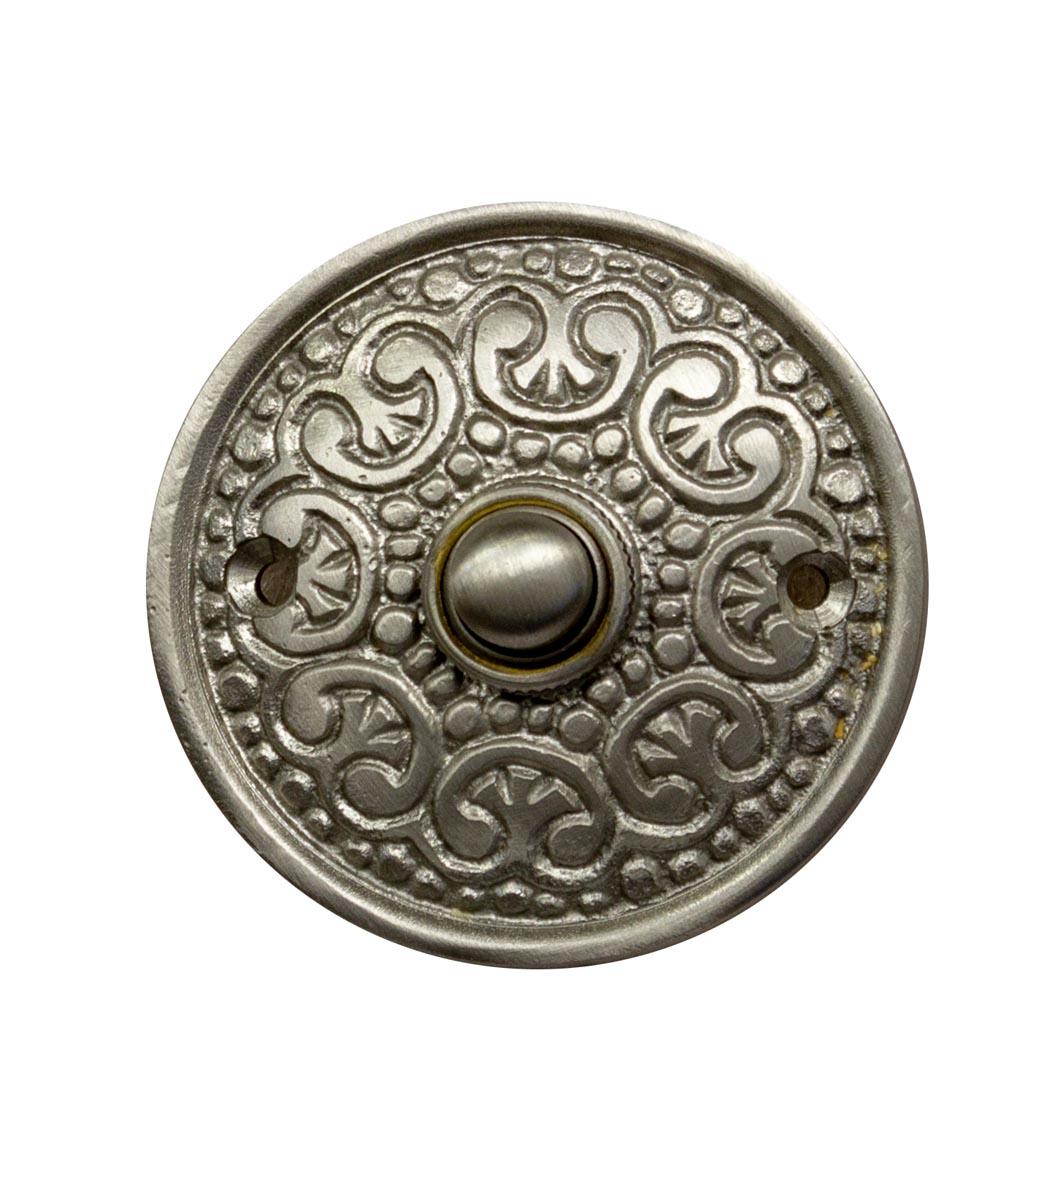 Round Ornate Doorbell